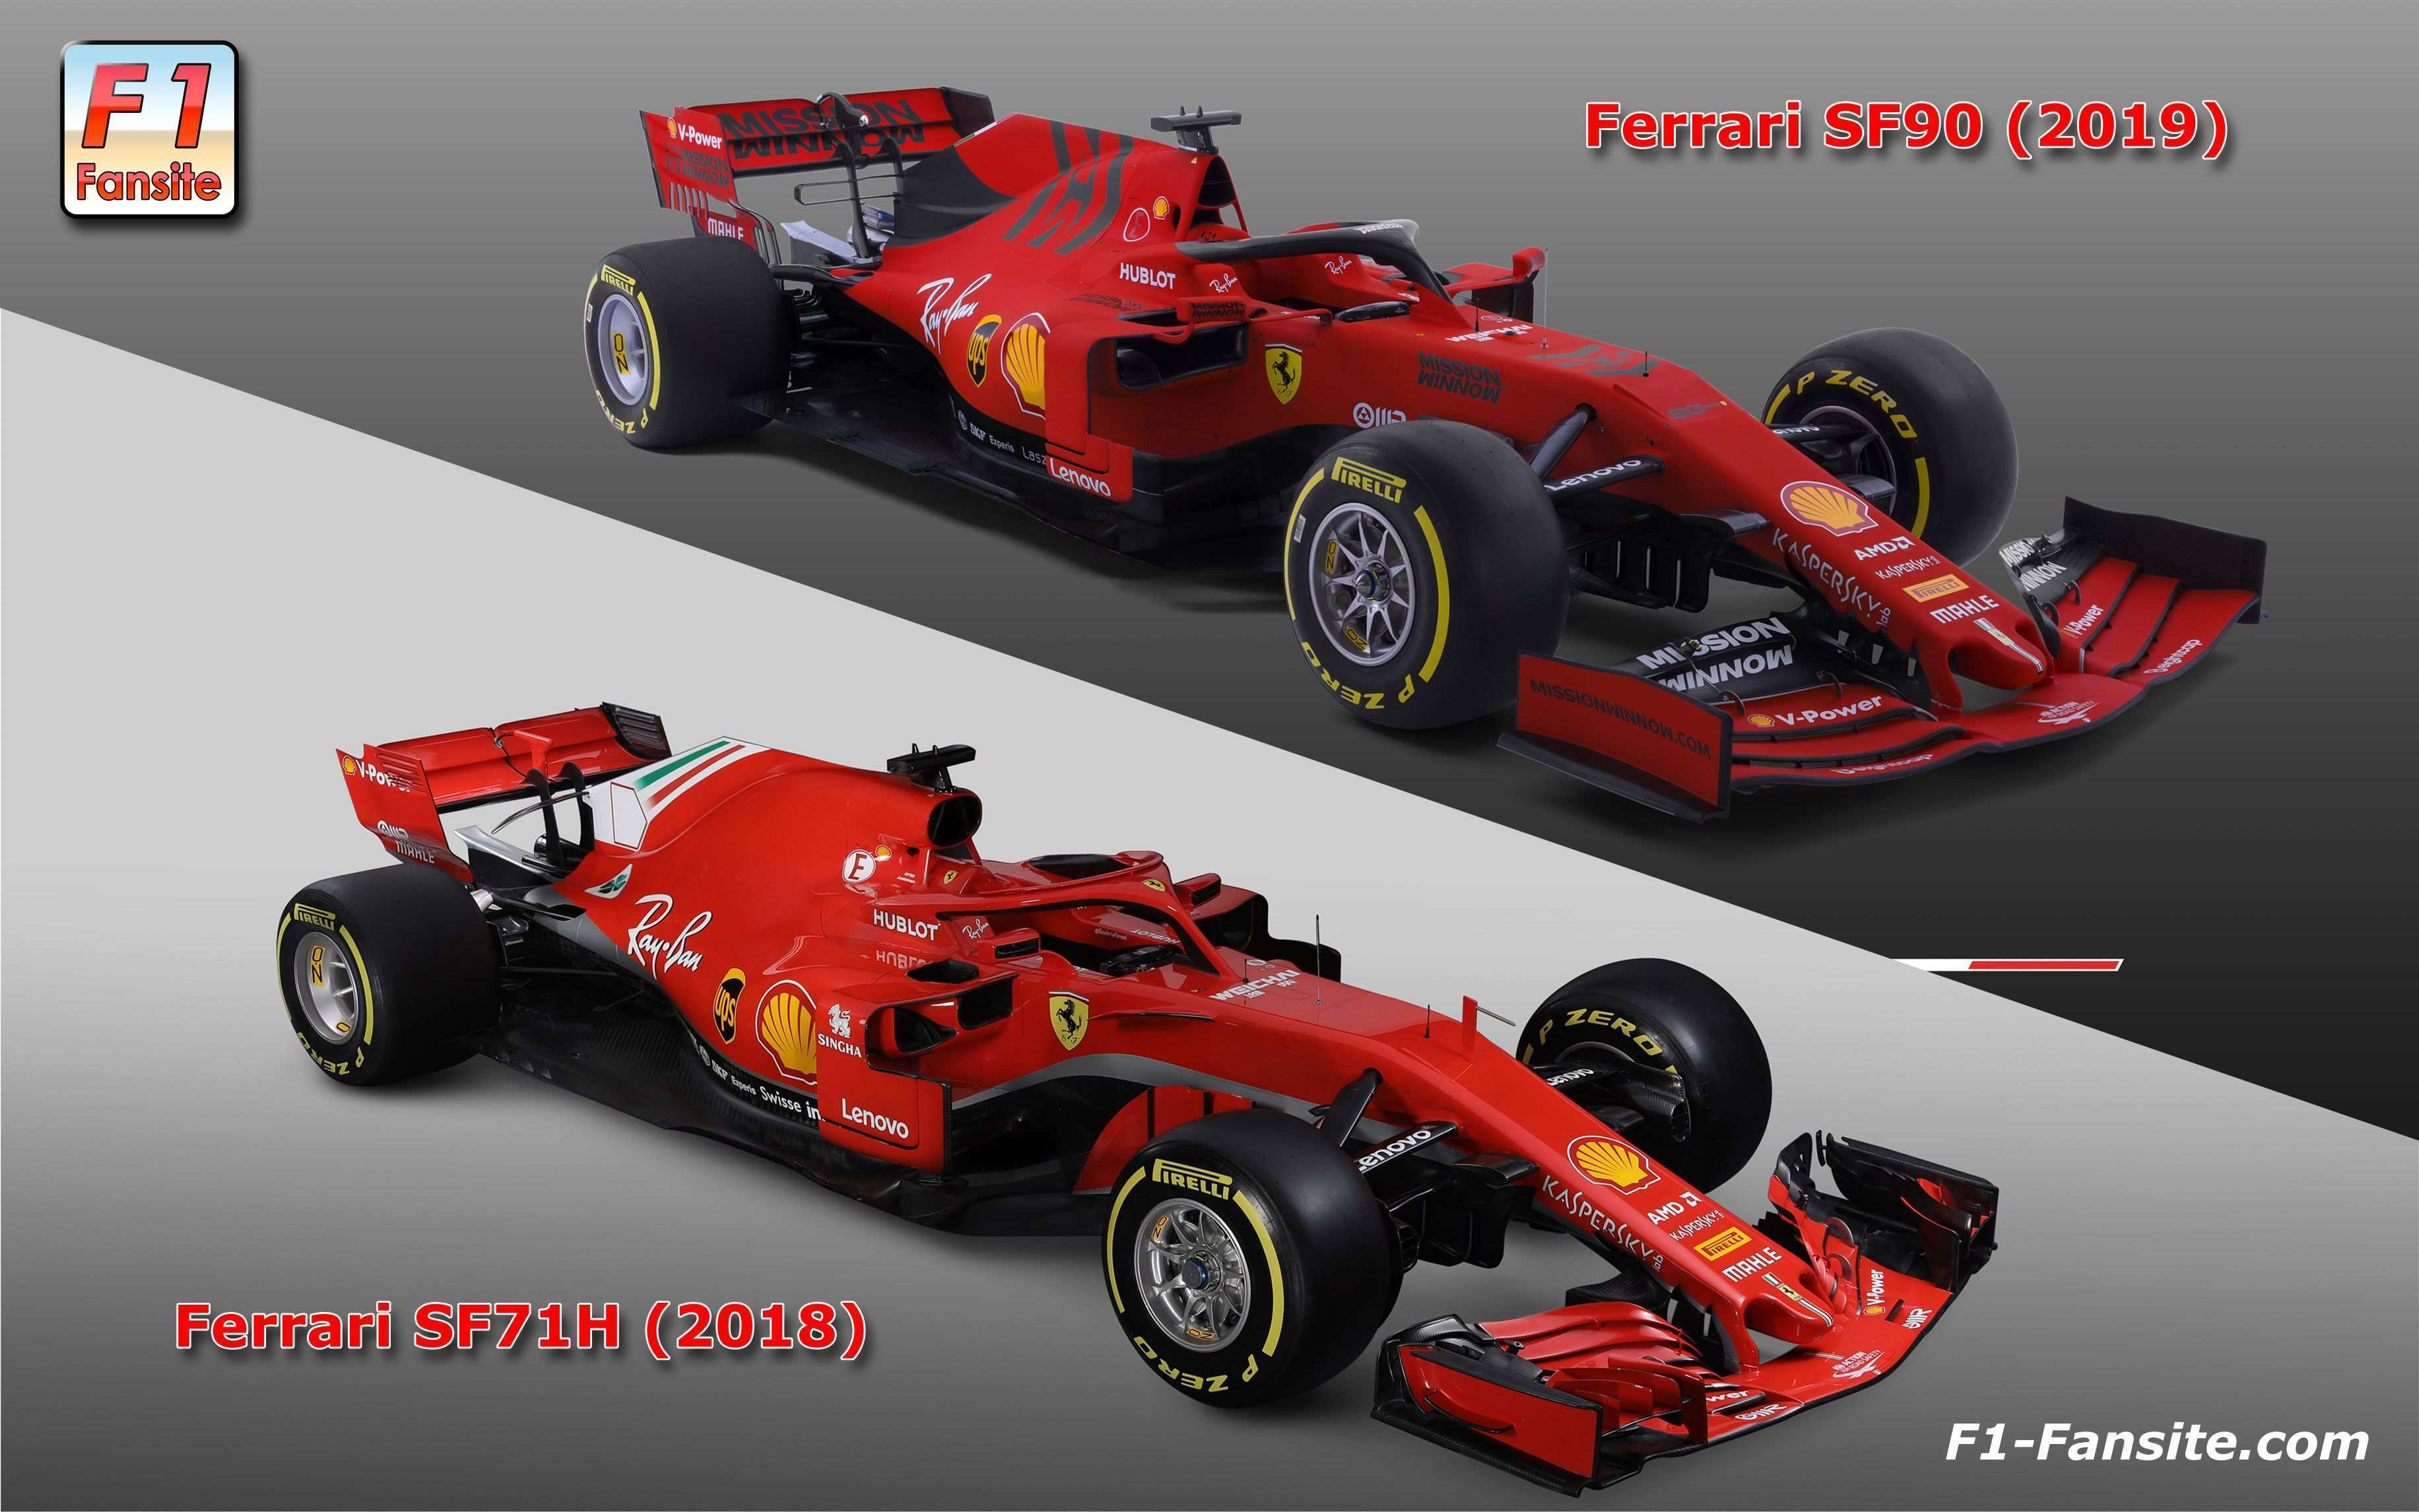 11 Concept of Ferrari 2019 Formula 1 Price And Release Date Ratings with Ferrari 2019 Formula 1 Price And Release Date